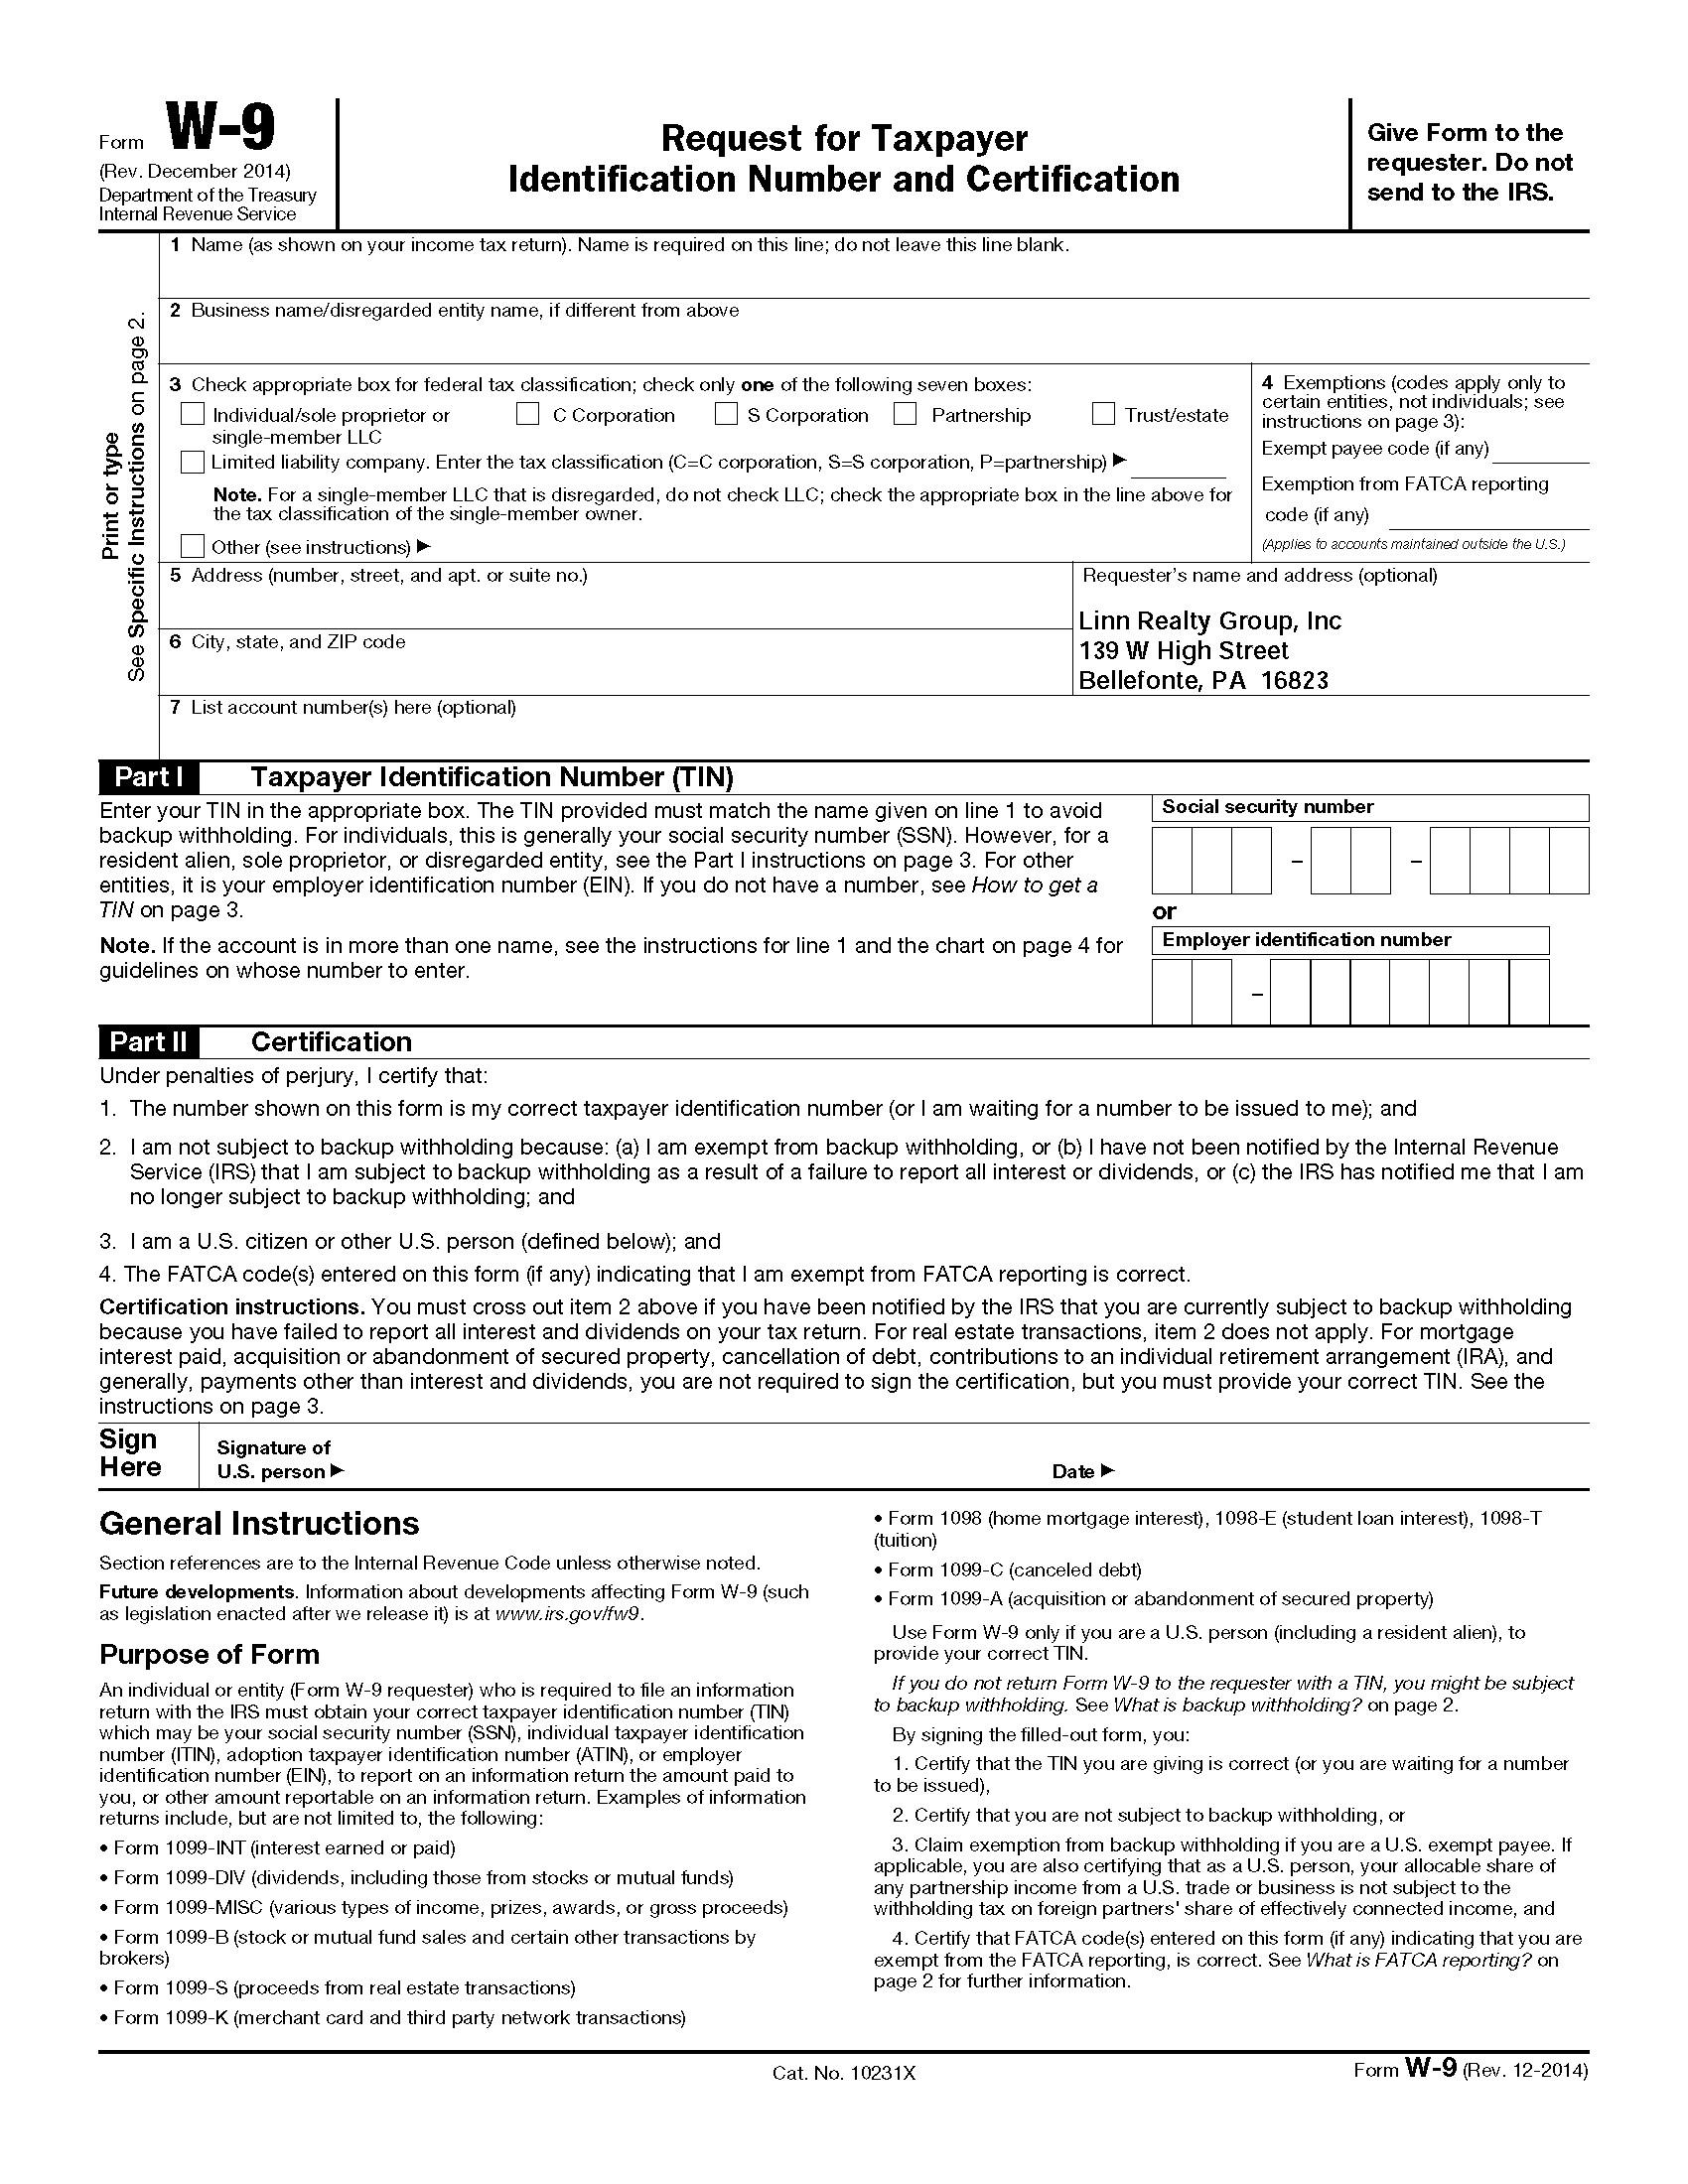 Blank 2019 W 9 Form Printable   Calendar Template Printable-Blank W-9 Form 2020 Printable